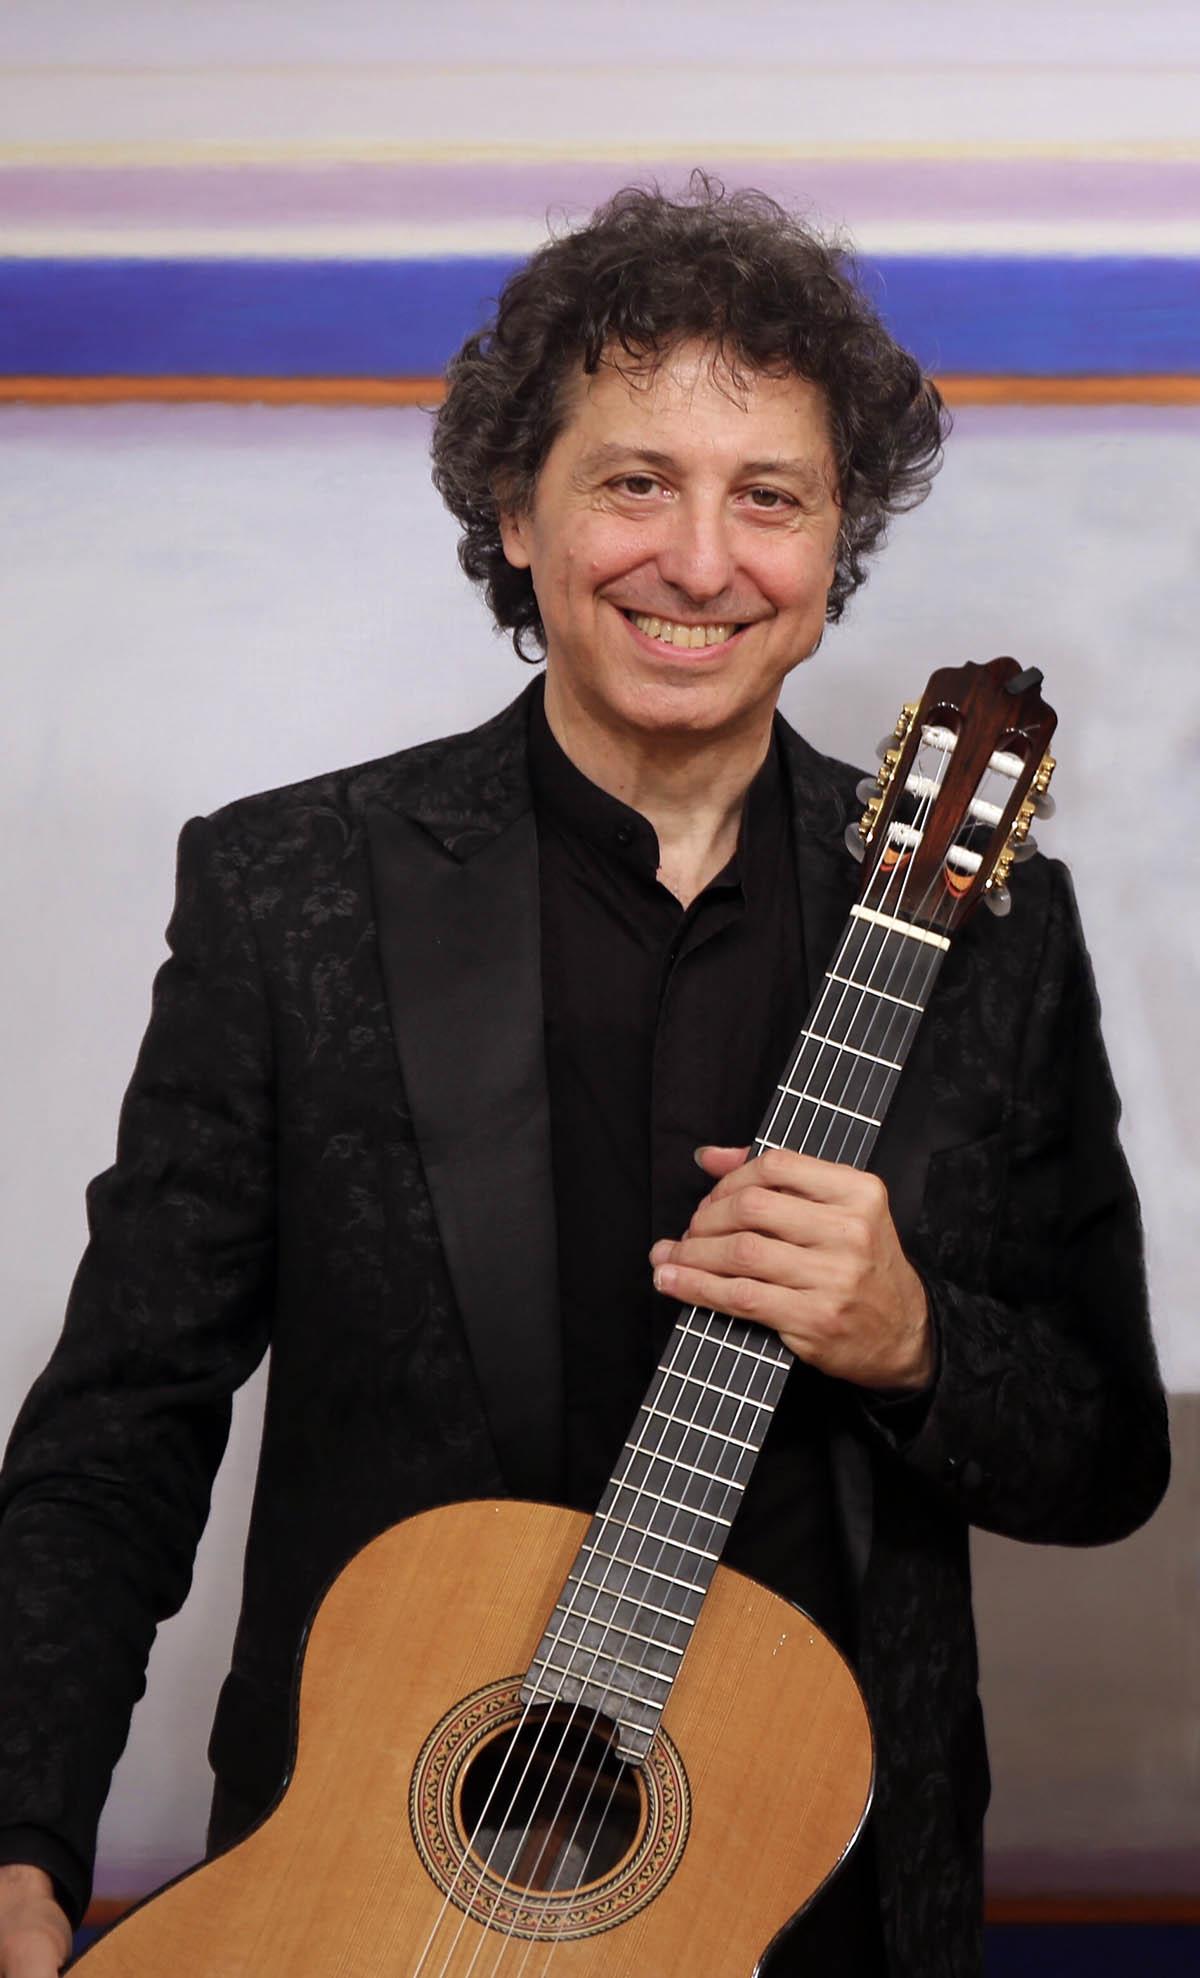 Roberto Porroni